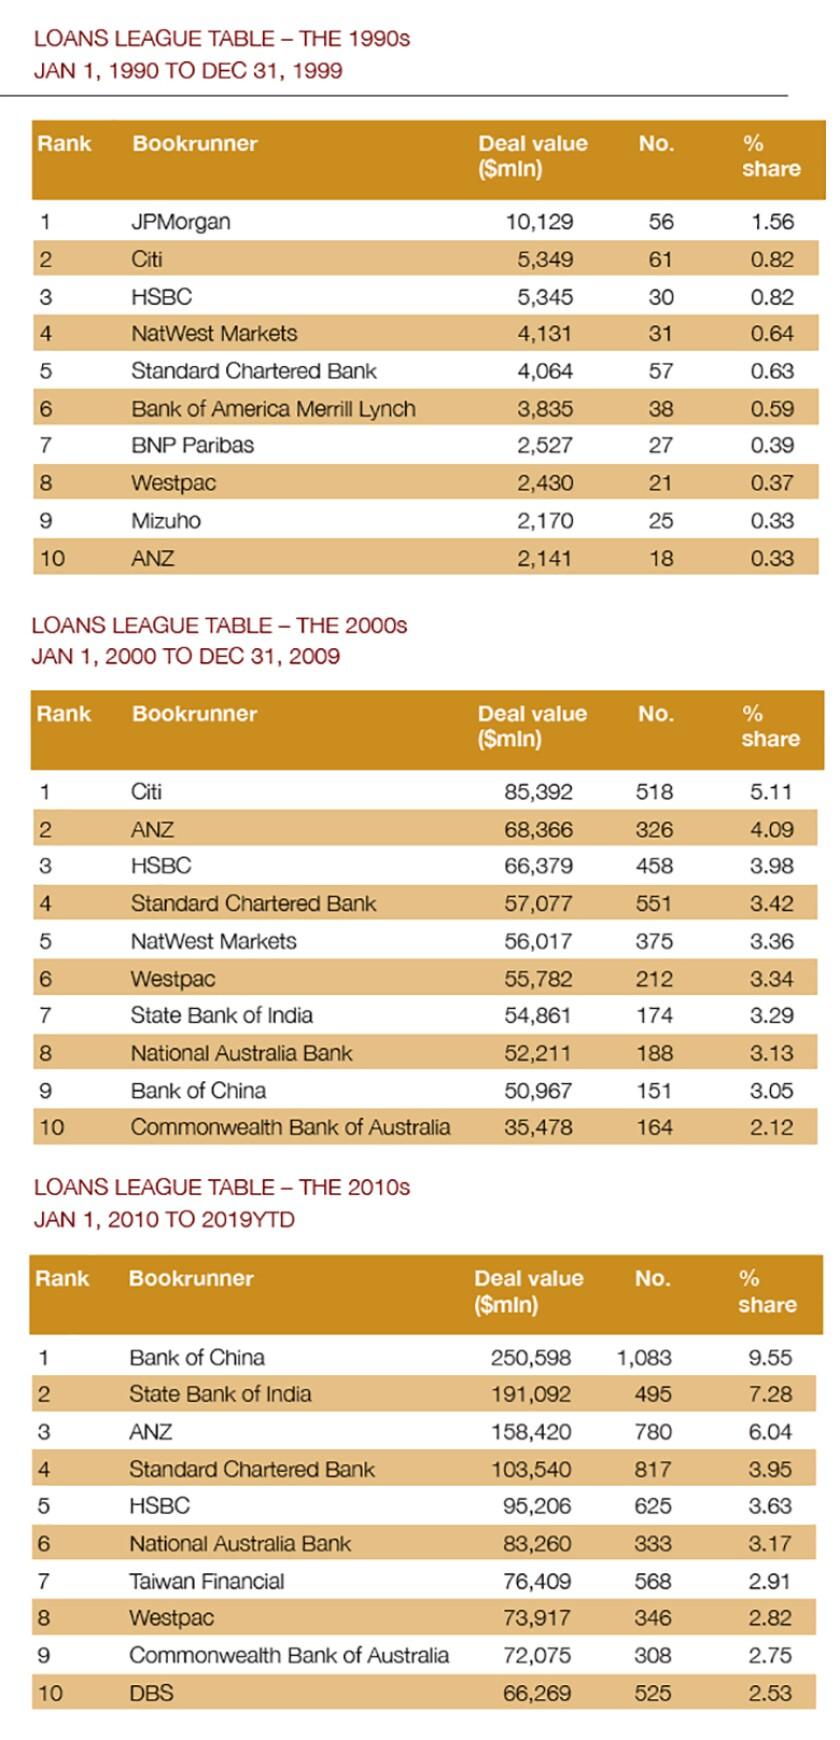 Loans league table